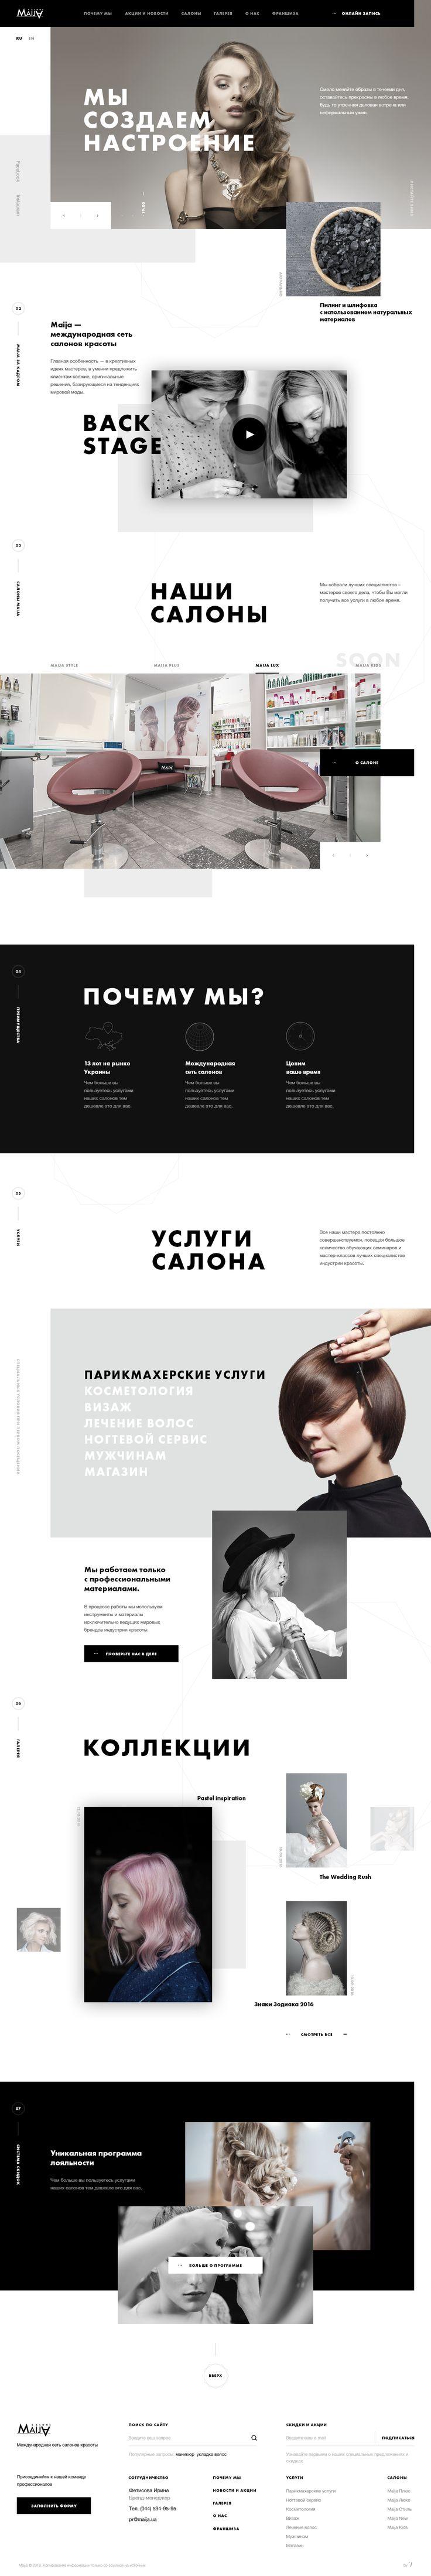 Maija -- Fashion Ui Design concept and Visual Identity.